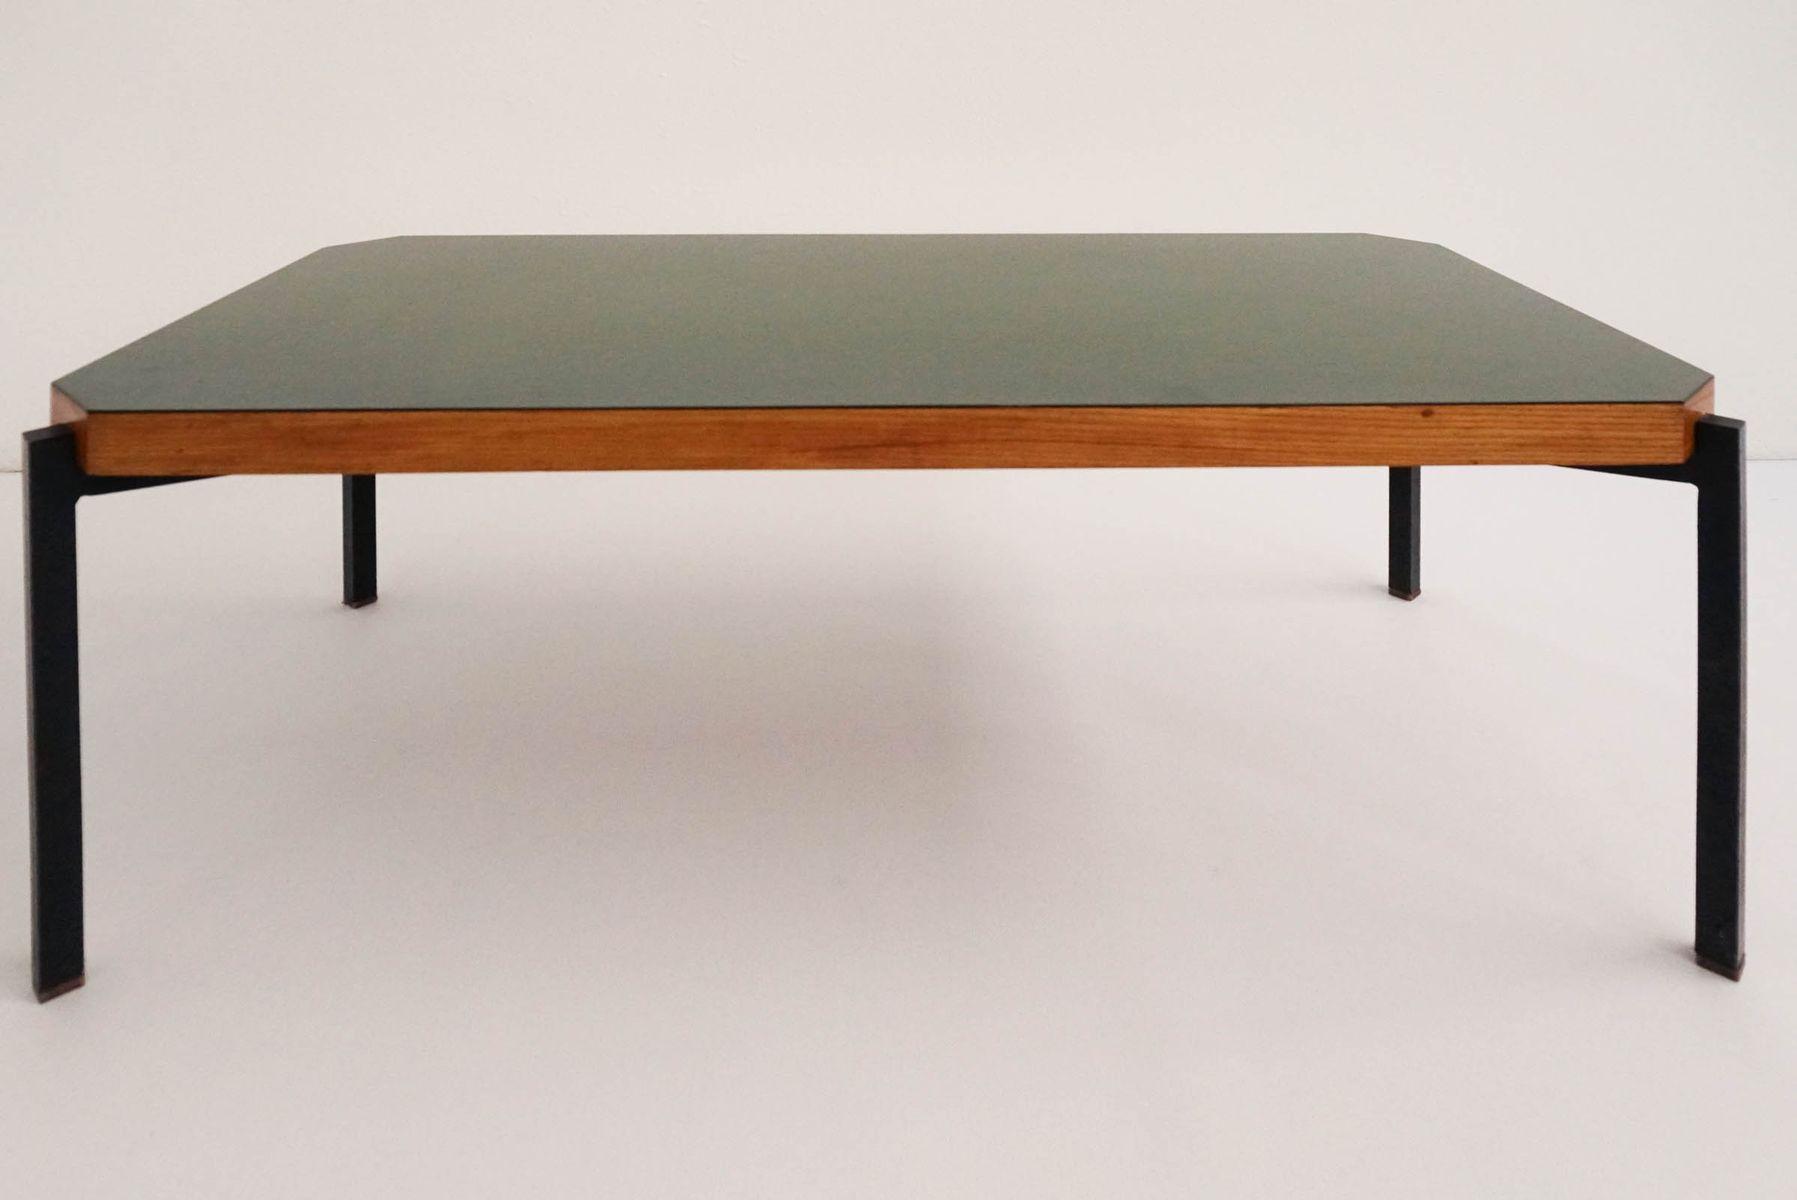 Minimal Italian Olive Green Coffee Table, 1960s